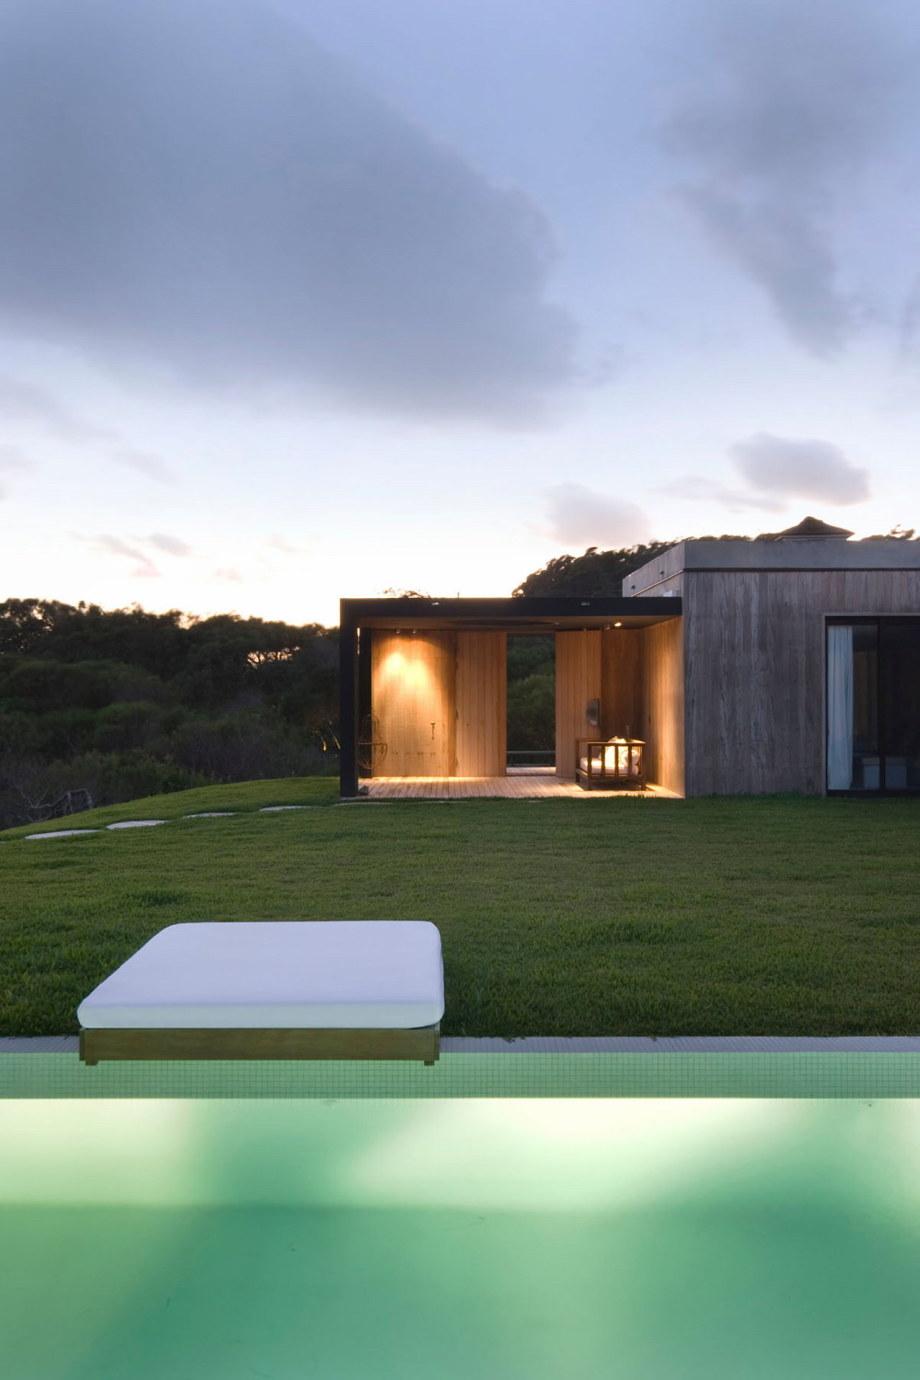 The beach house La Boyita Residence by Martin Gomez Arguitectos, Uruguay 34